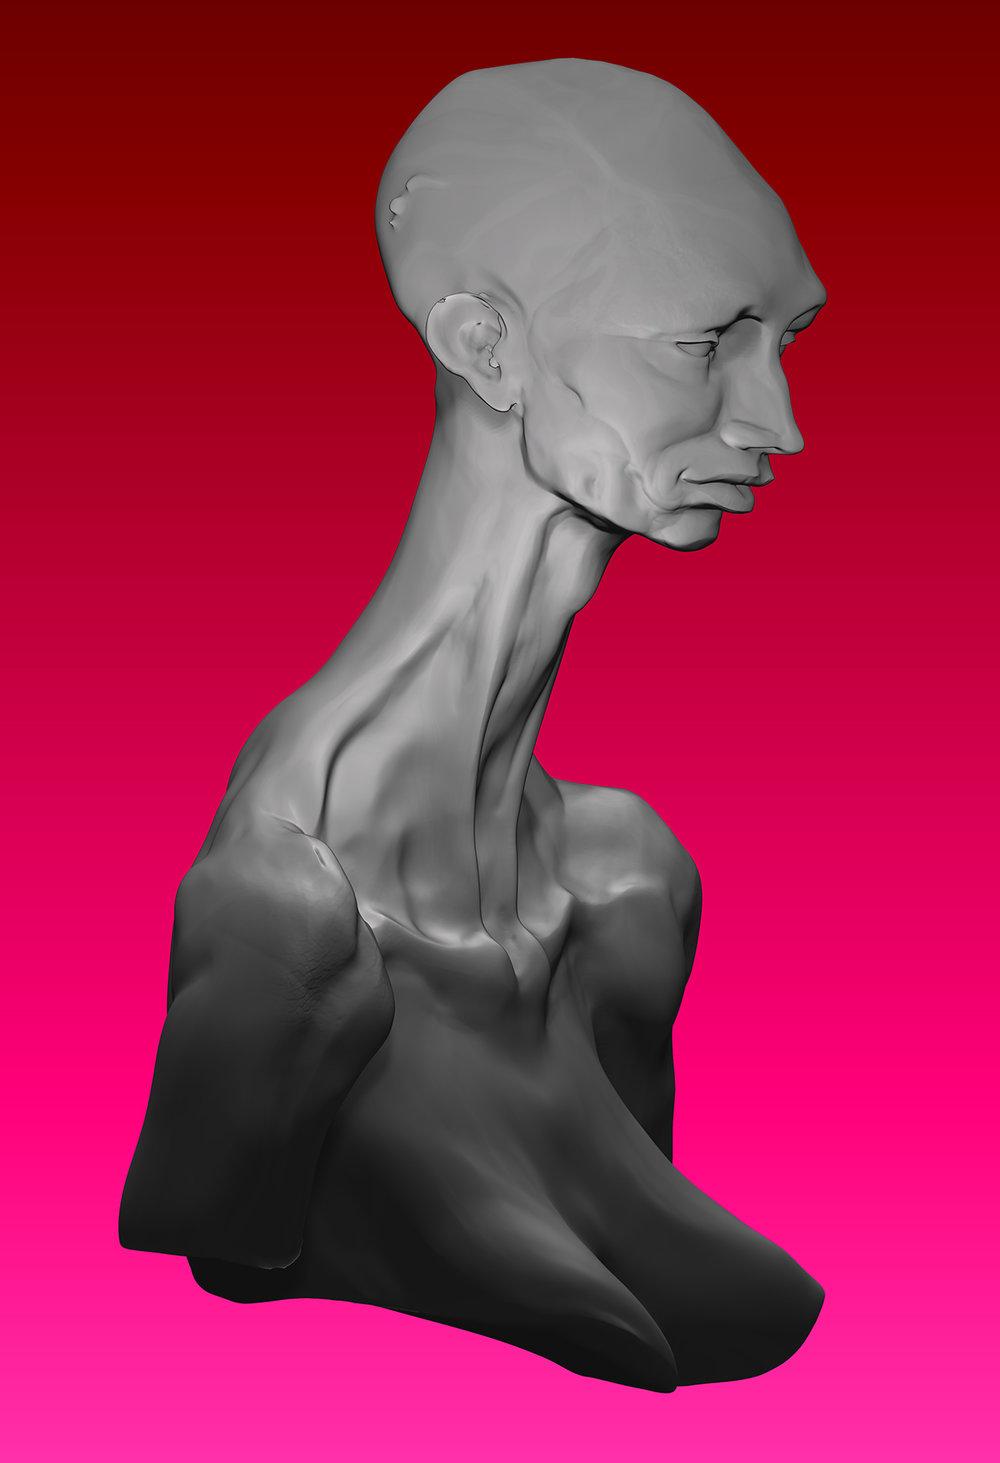 Max+Brazier-Jones+concept+art+zbrush+portrait+sculpture.jpeg